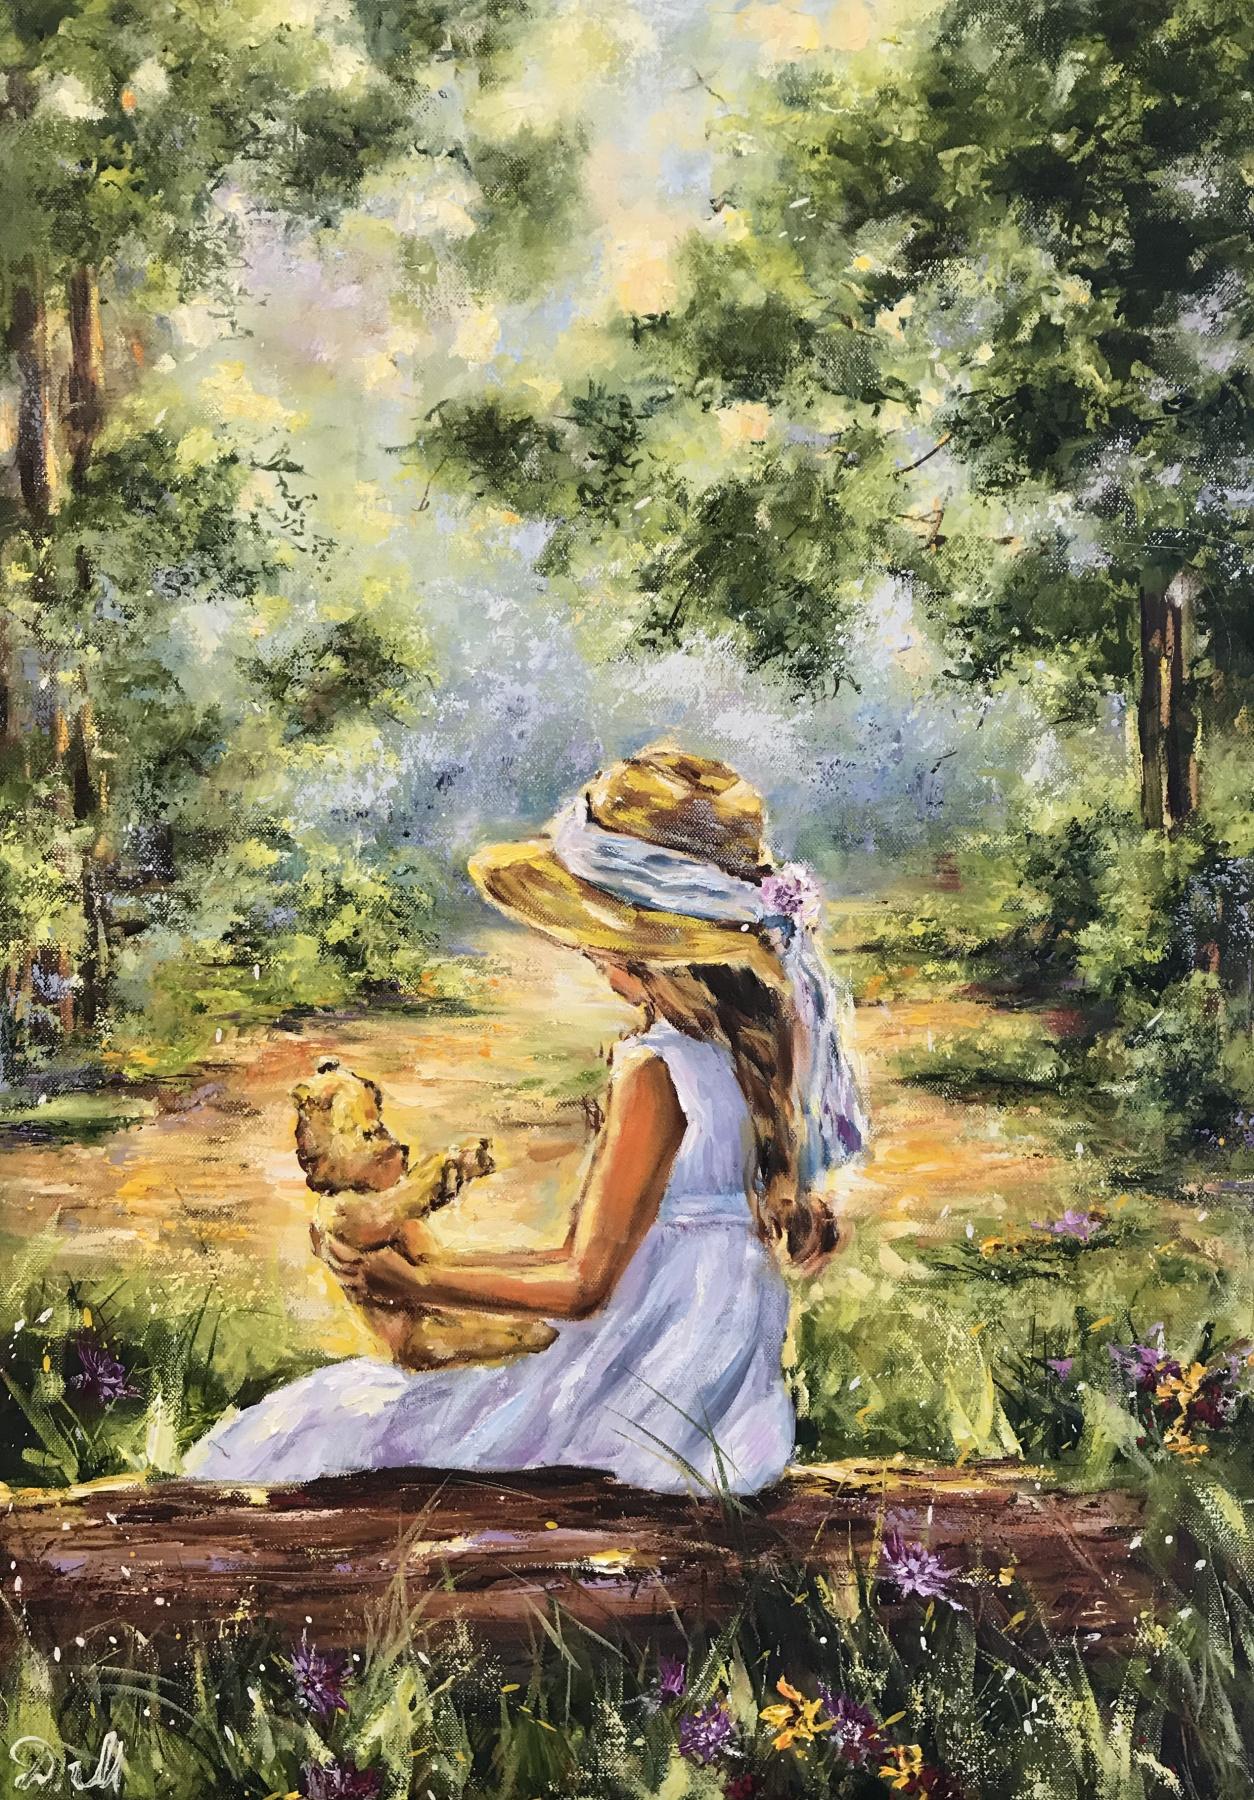 Диана Владимировна Маливани. A Sunny Day